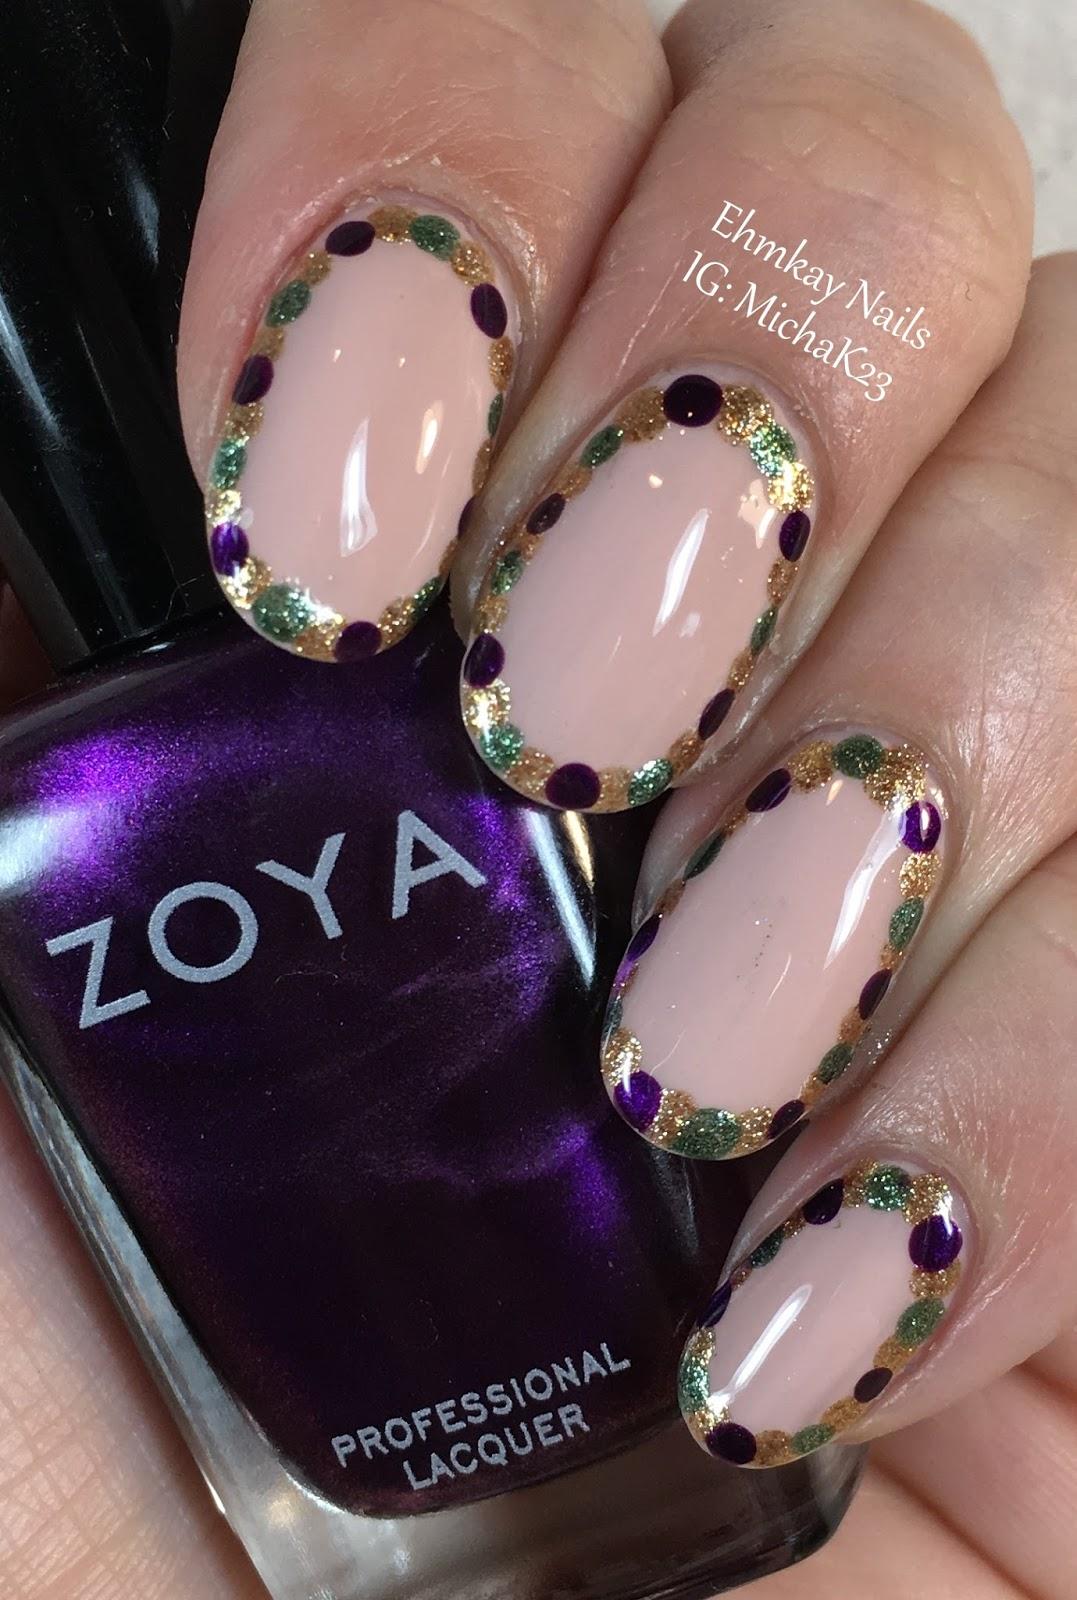 Ehmkay nails mardi gras nail art show us your beads mardi gras nail art show us your beads prinsesfo Images